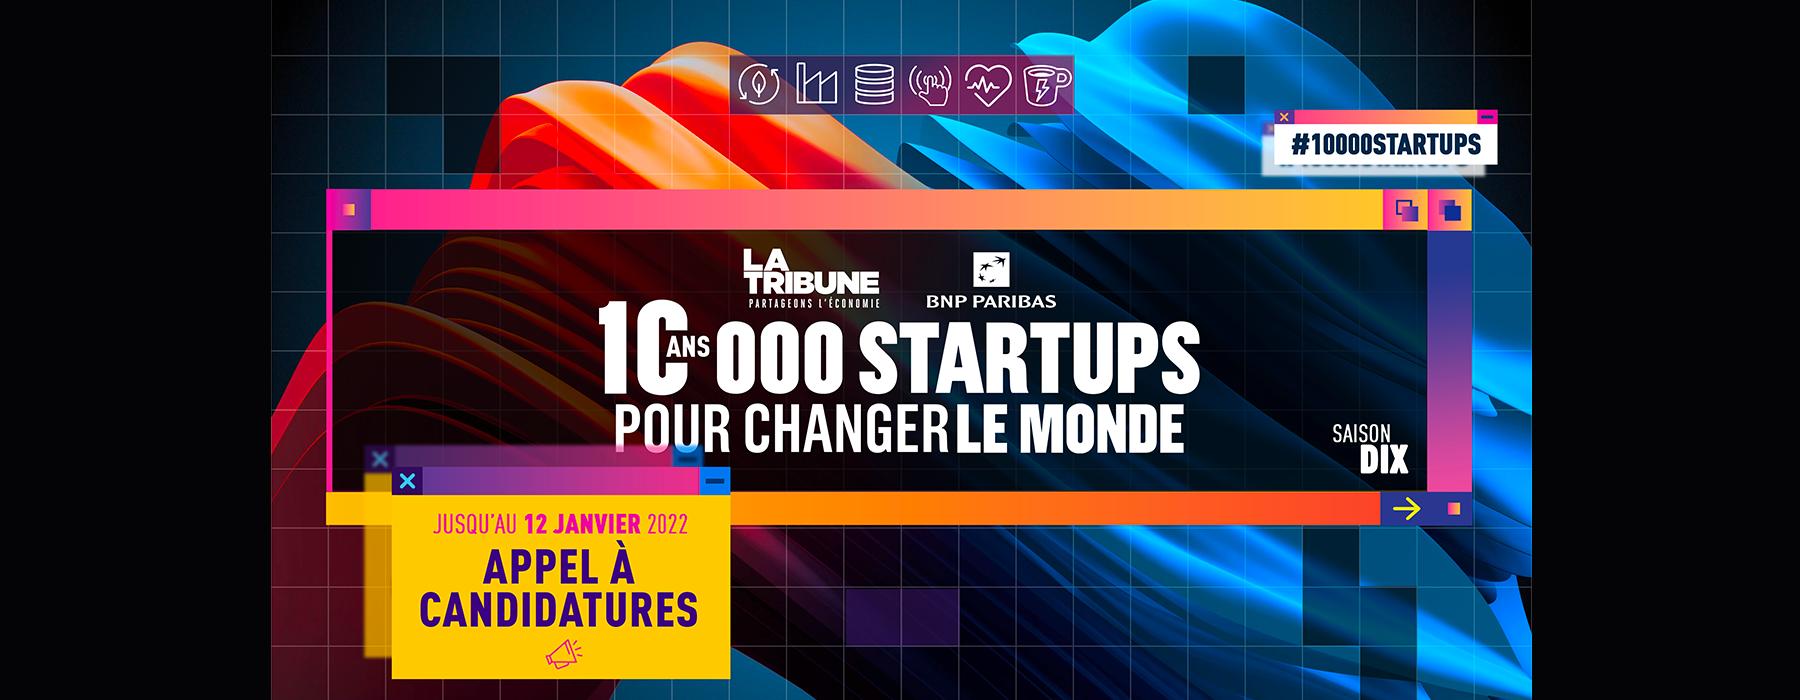 header 10 000 Startups pour changer le monde